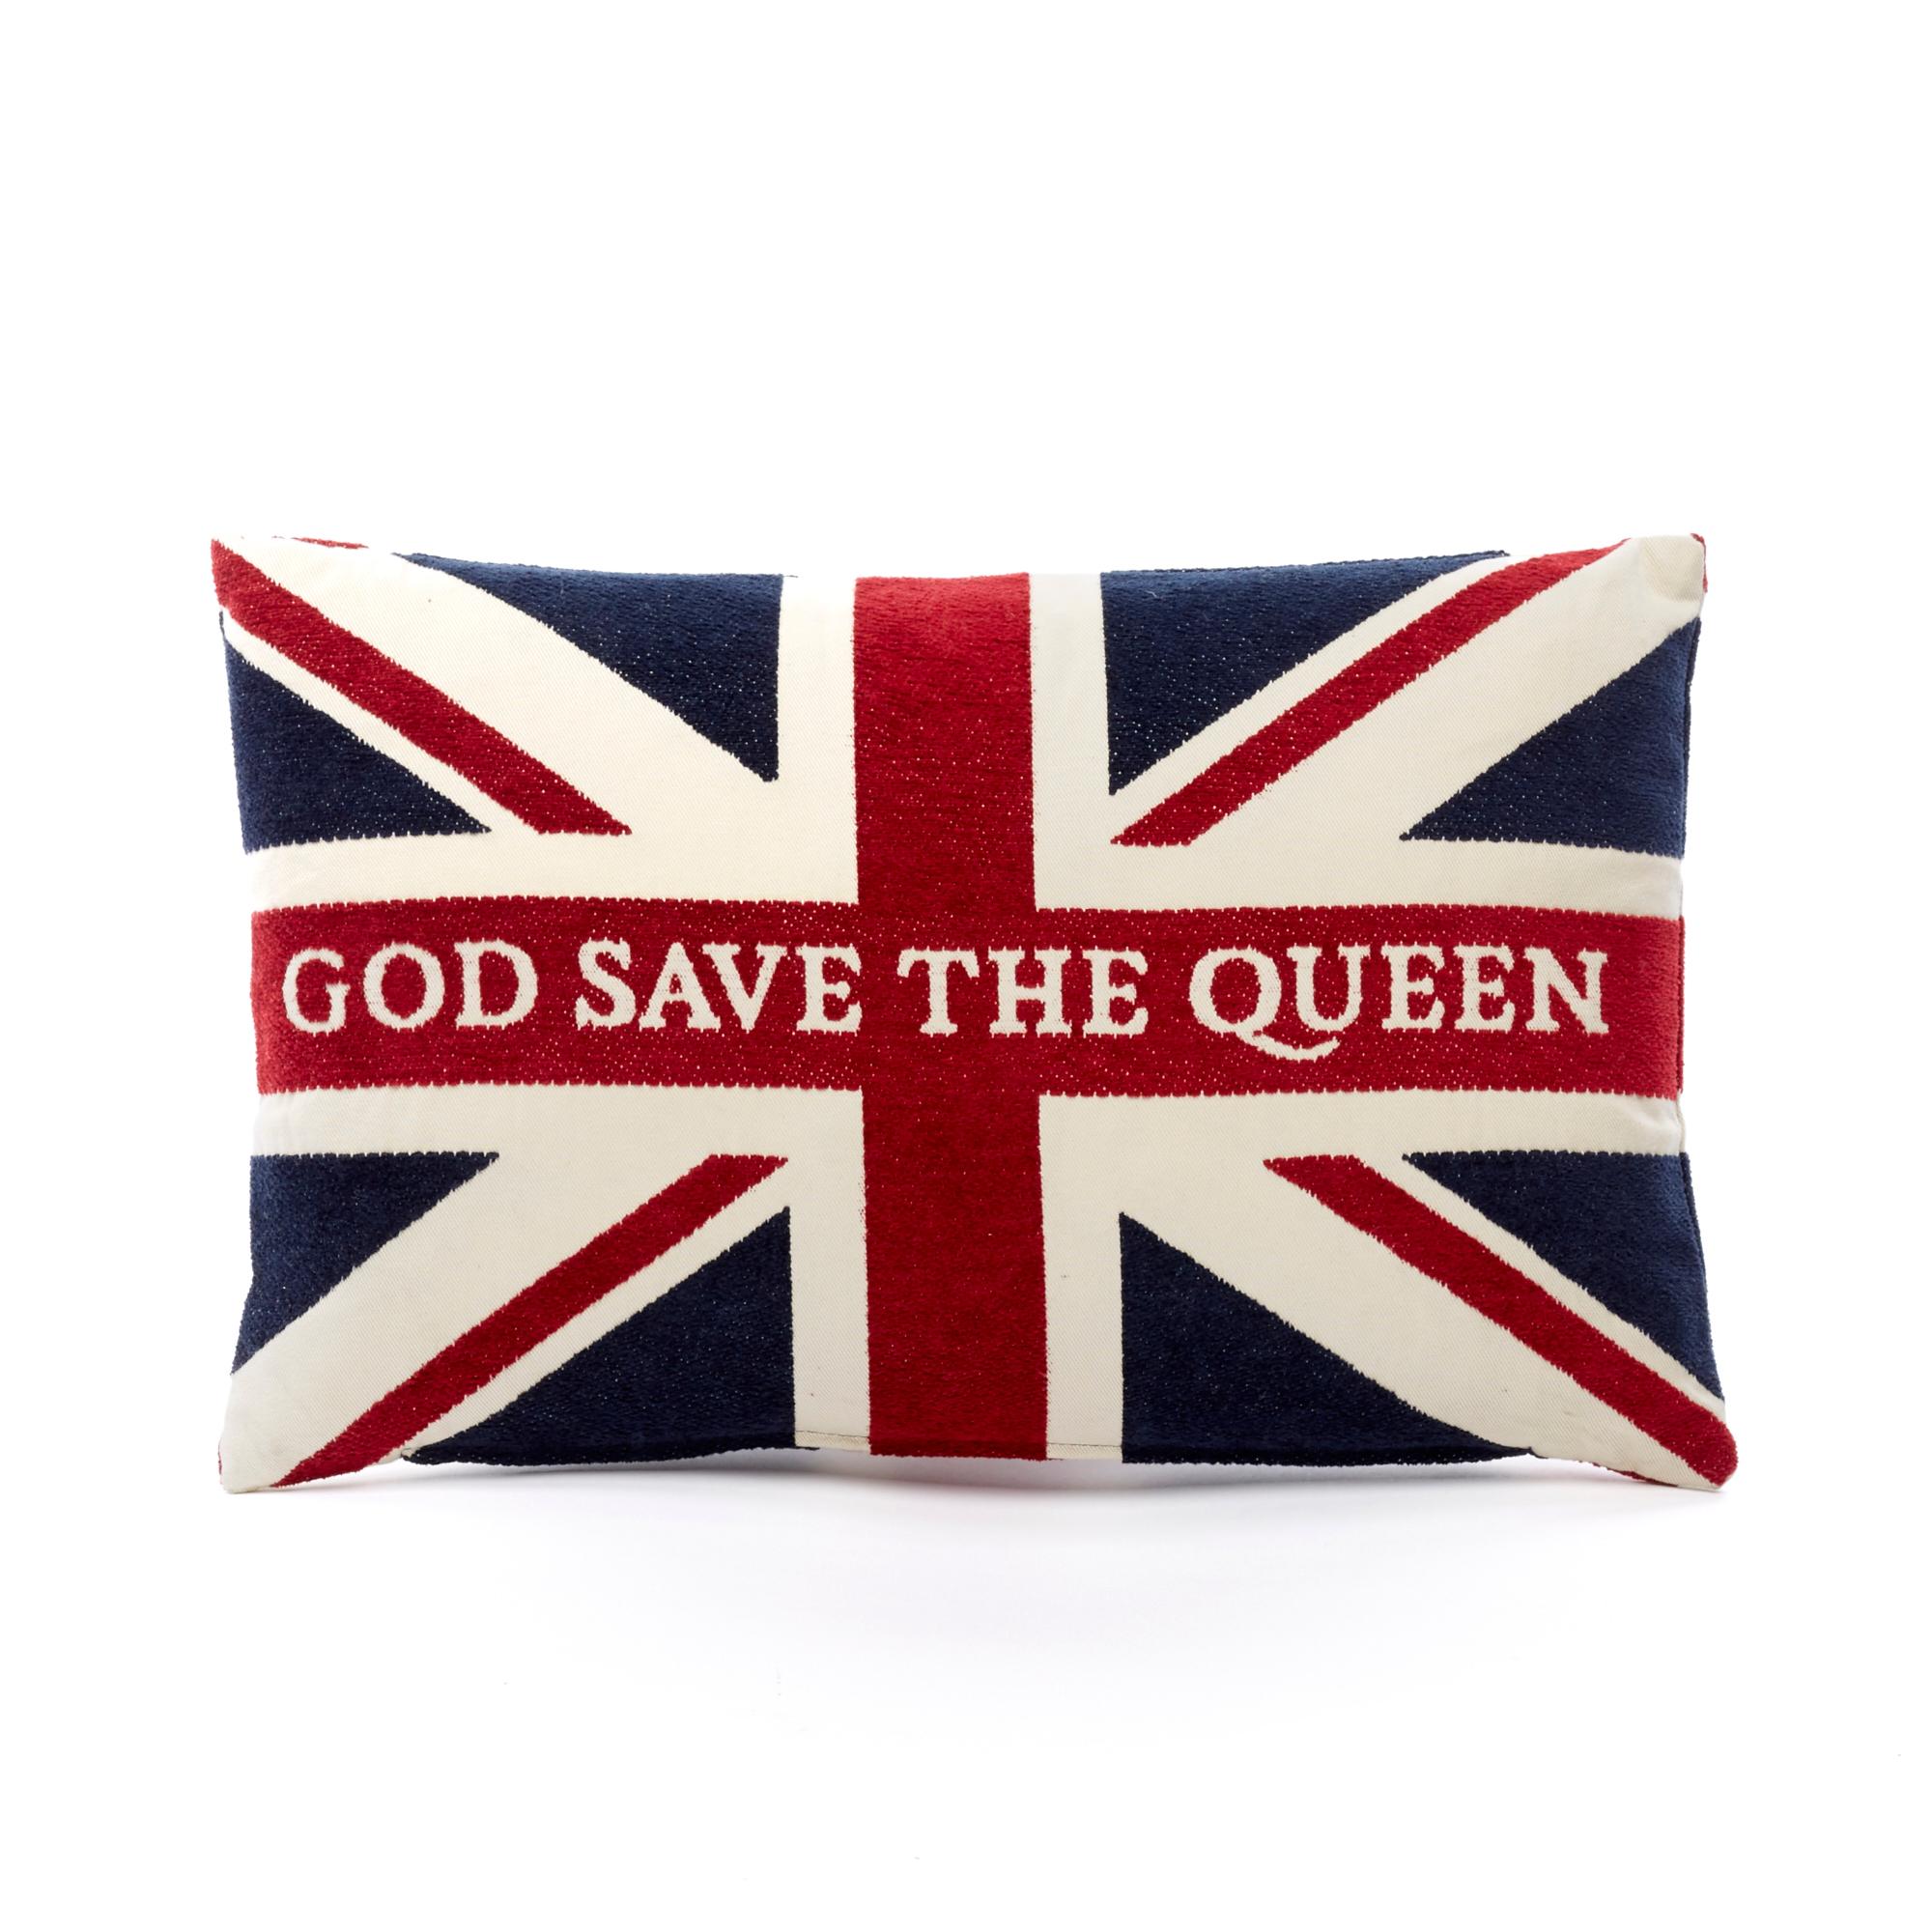 39 god save the queen 39 pillow gump 39 s. Black Bedroom Furniture Sets. Home Design Ideas